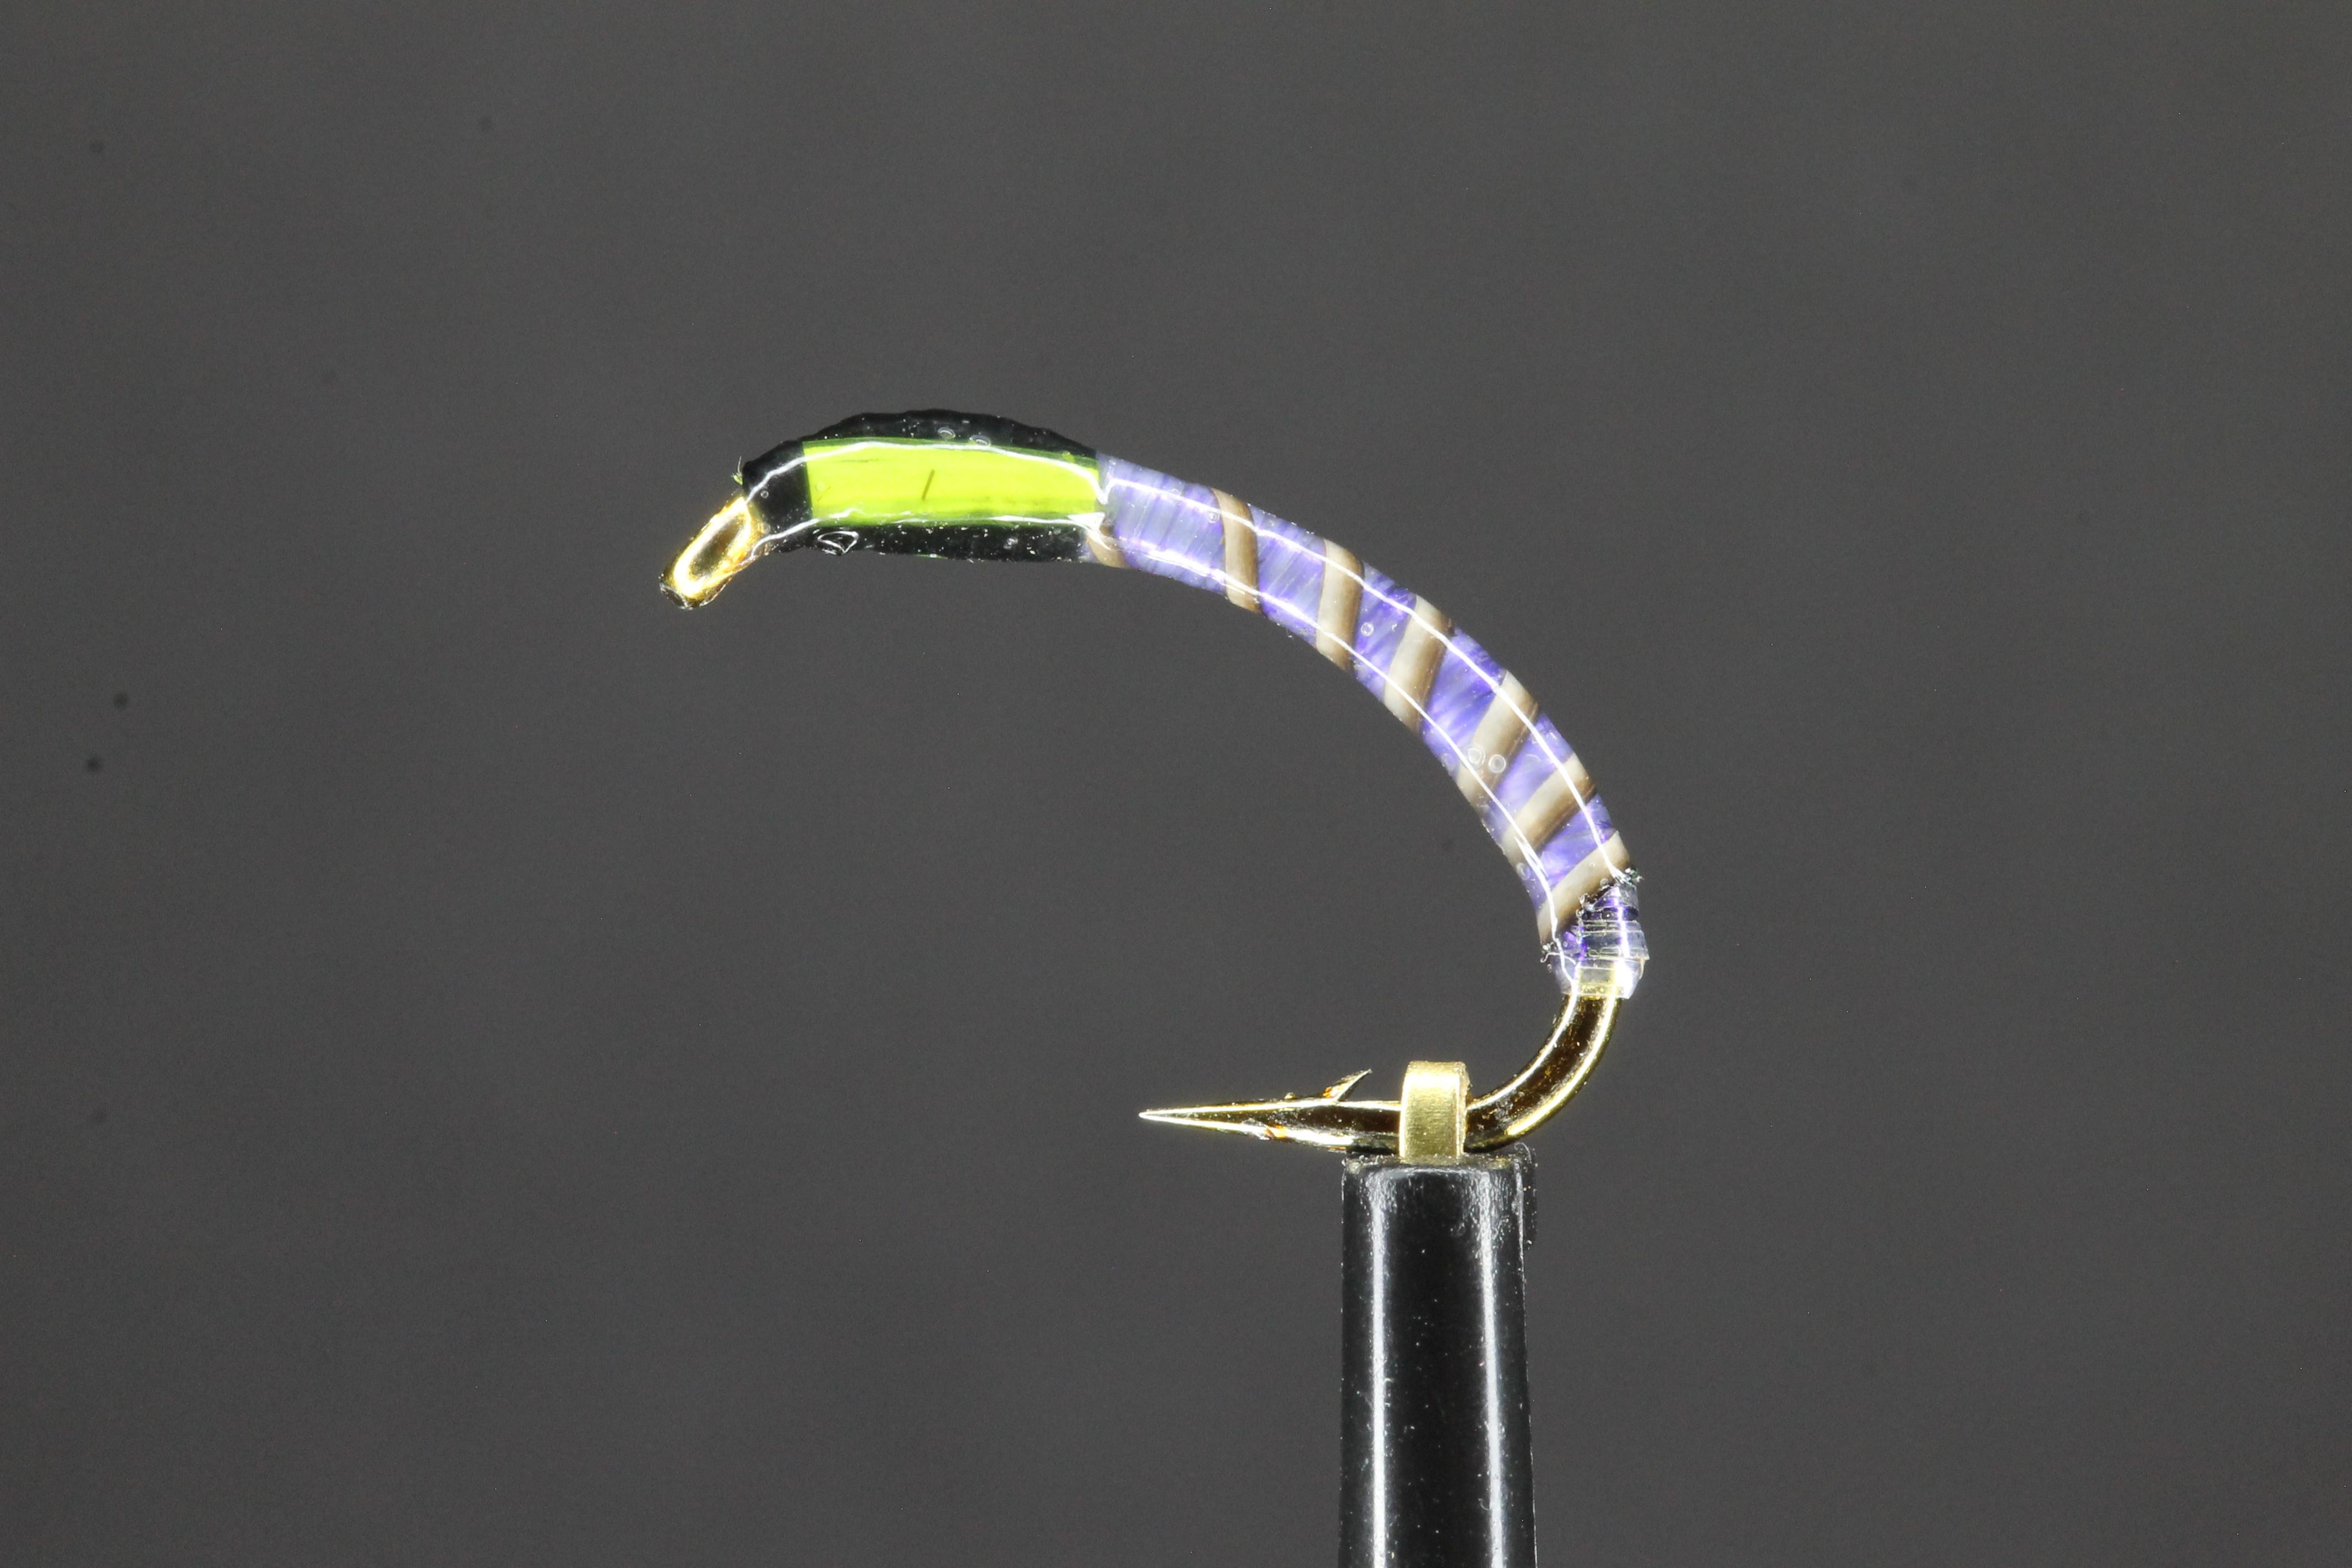 UV Quill Buzzer